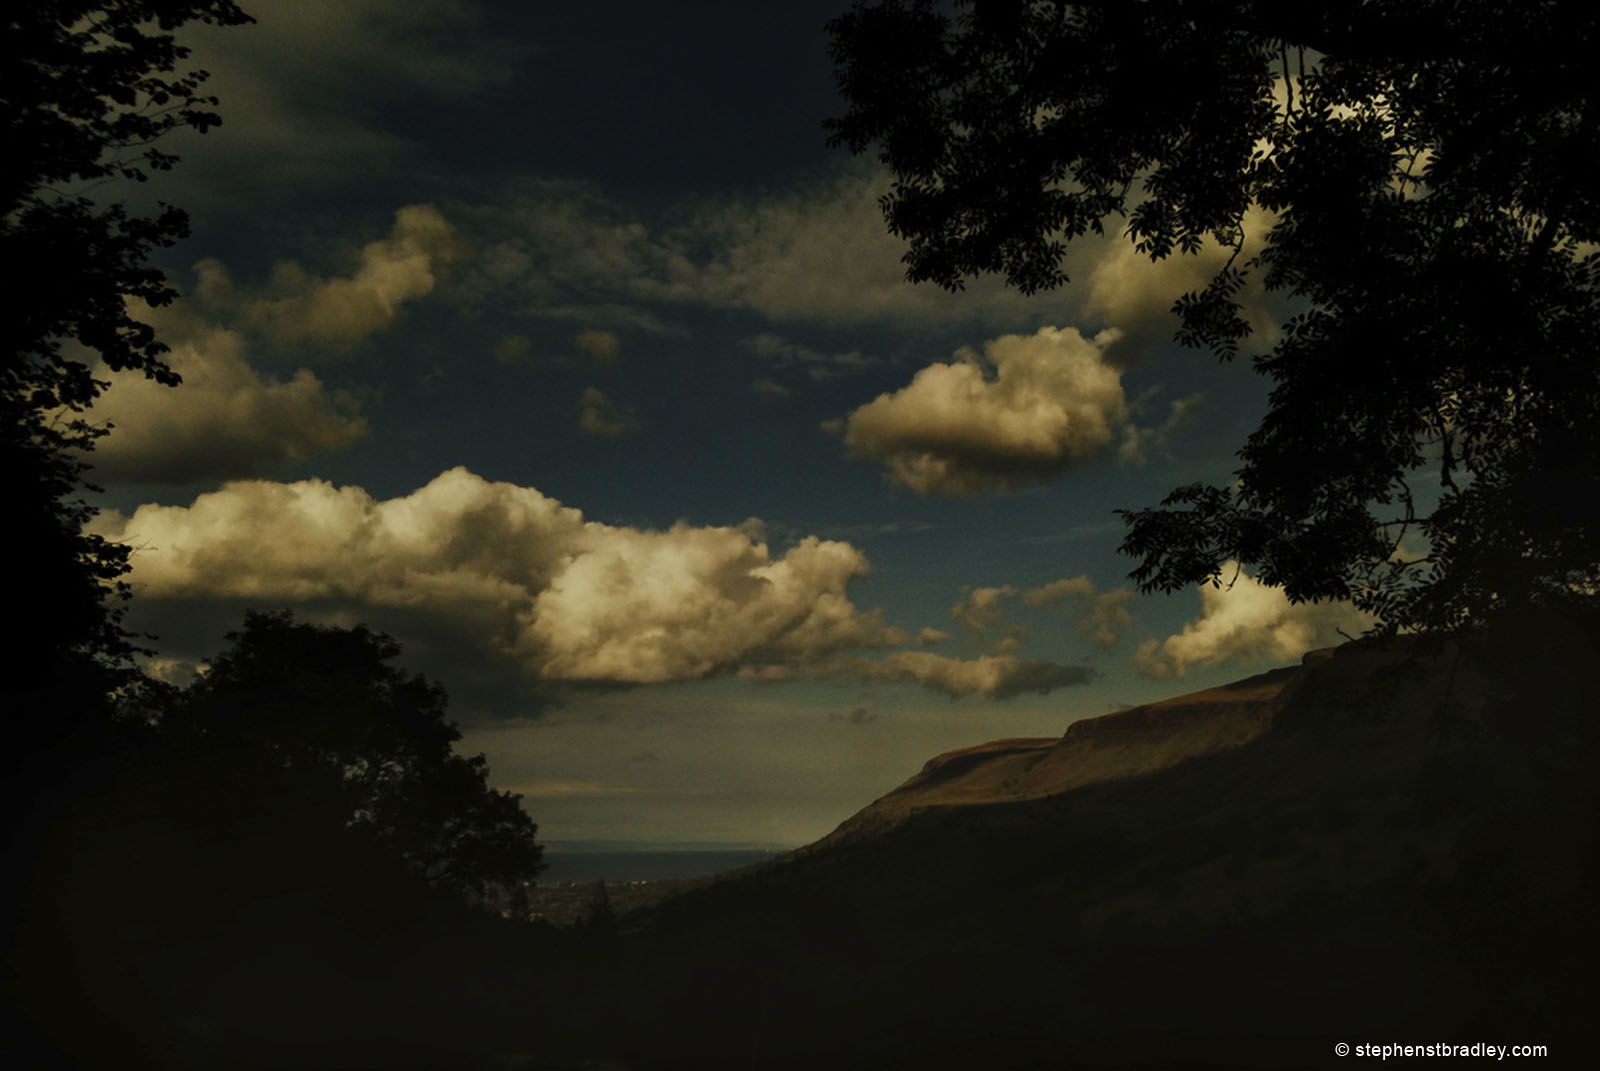 Commercial Photographer Atlanta landscape photo of clouds over Glenariff, Northern Ireland - photo 0305